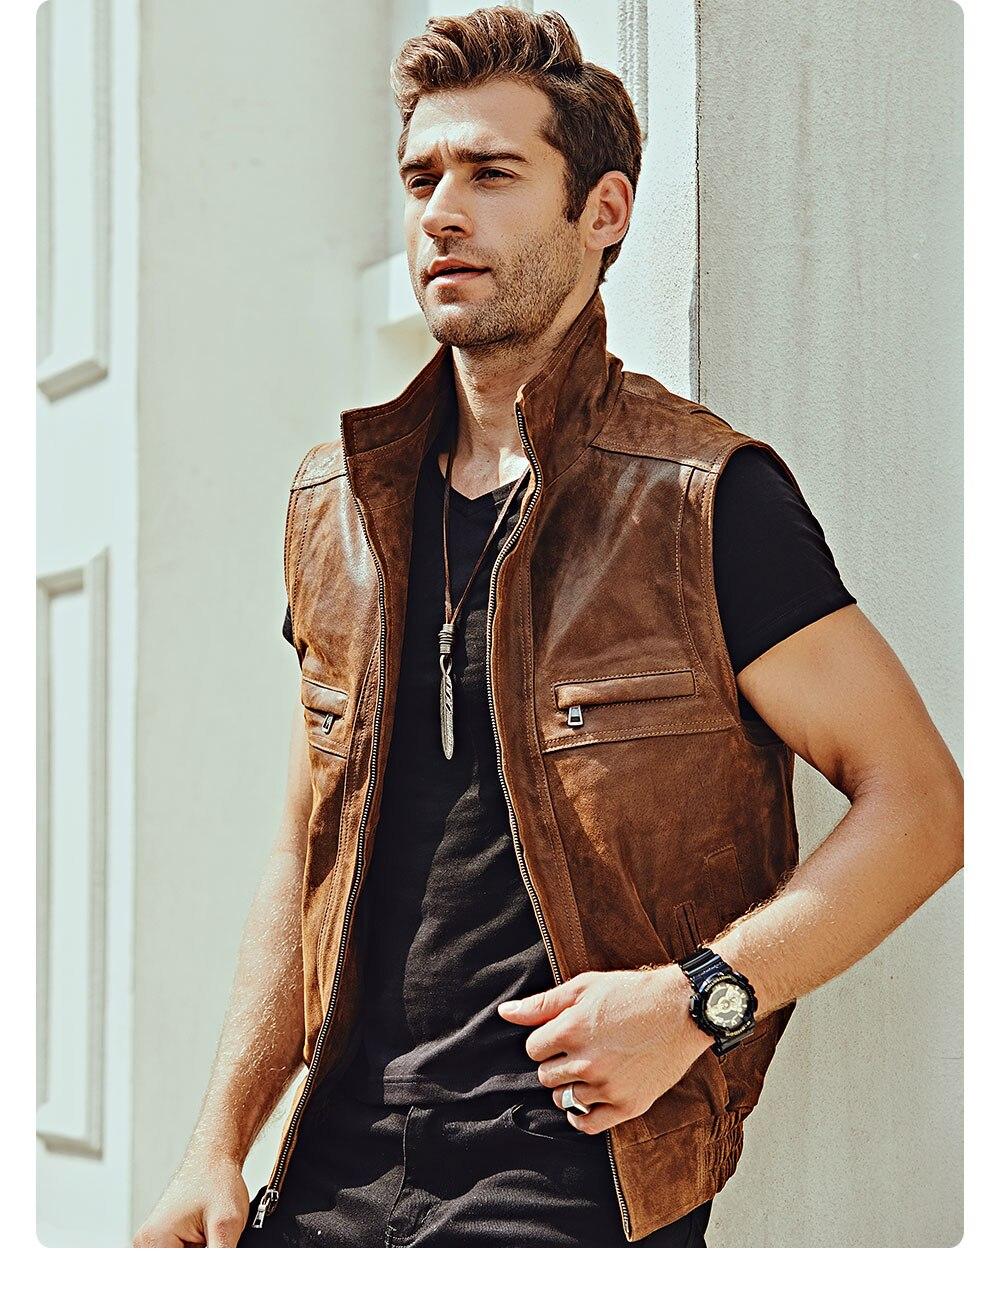 H3f916b8d3bcb4067ae6e37931299f8885 Mew Men's Leather Retro Vest Stand Collar Men's Motorcycle Casual Vest